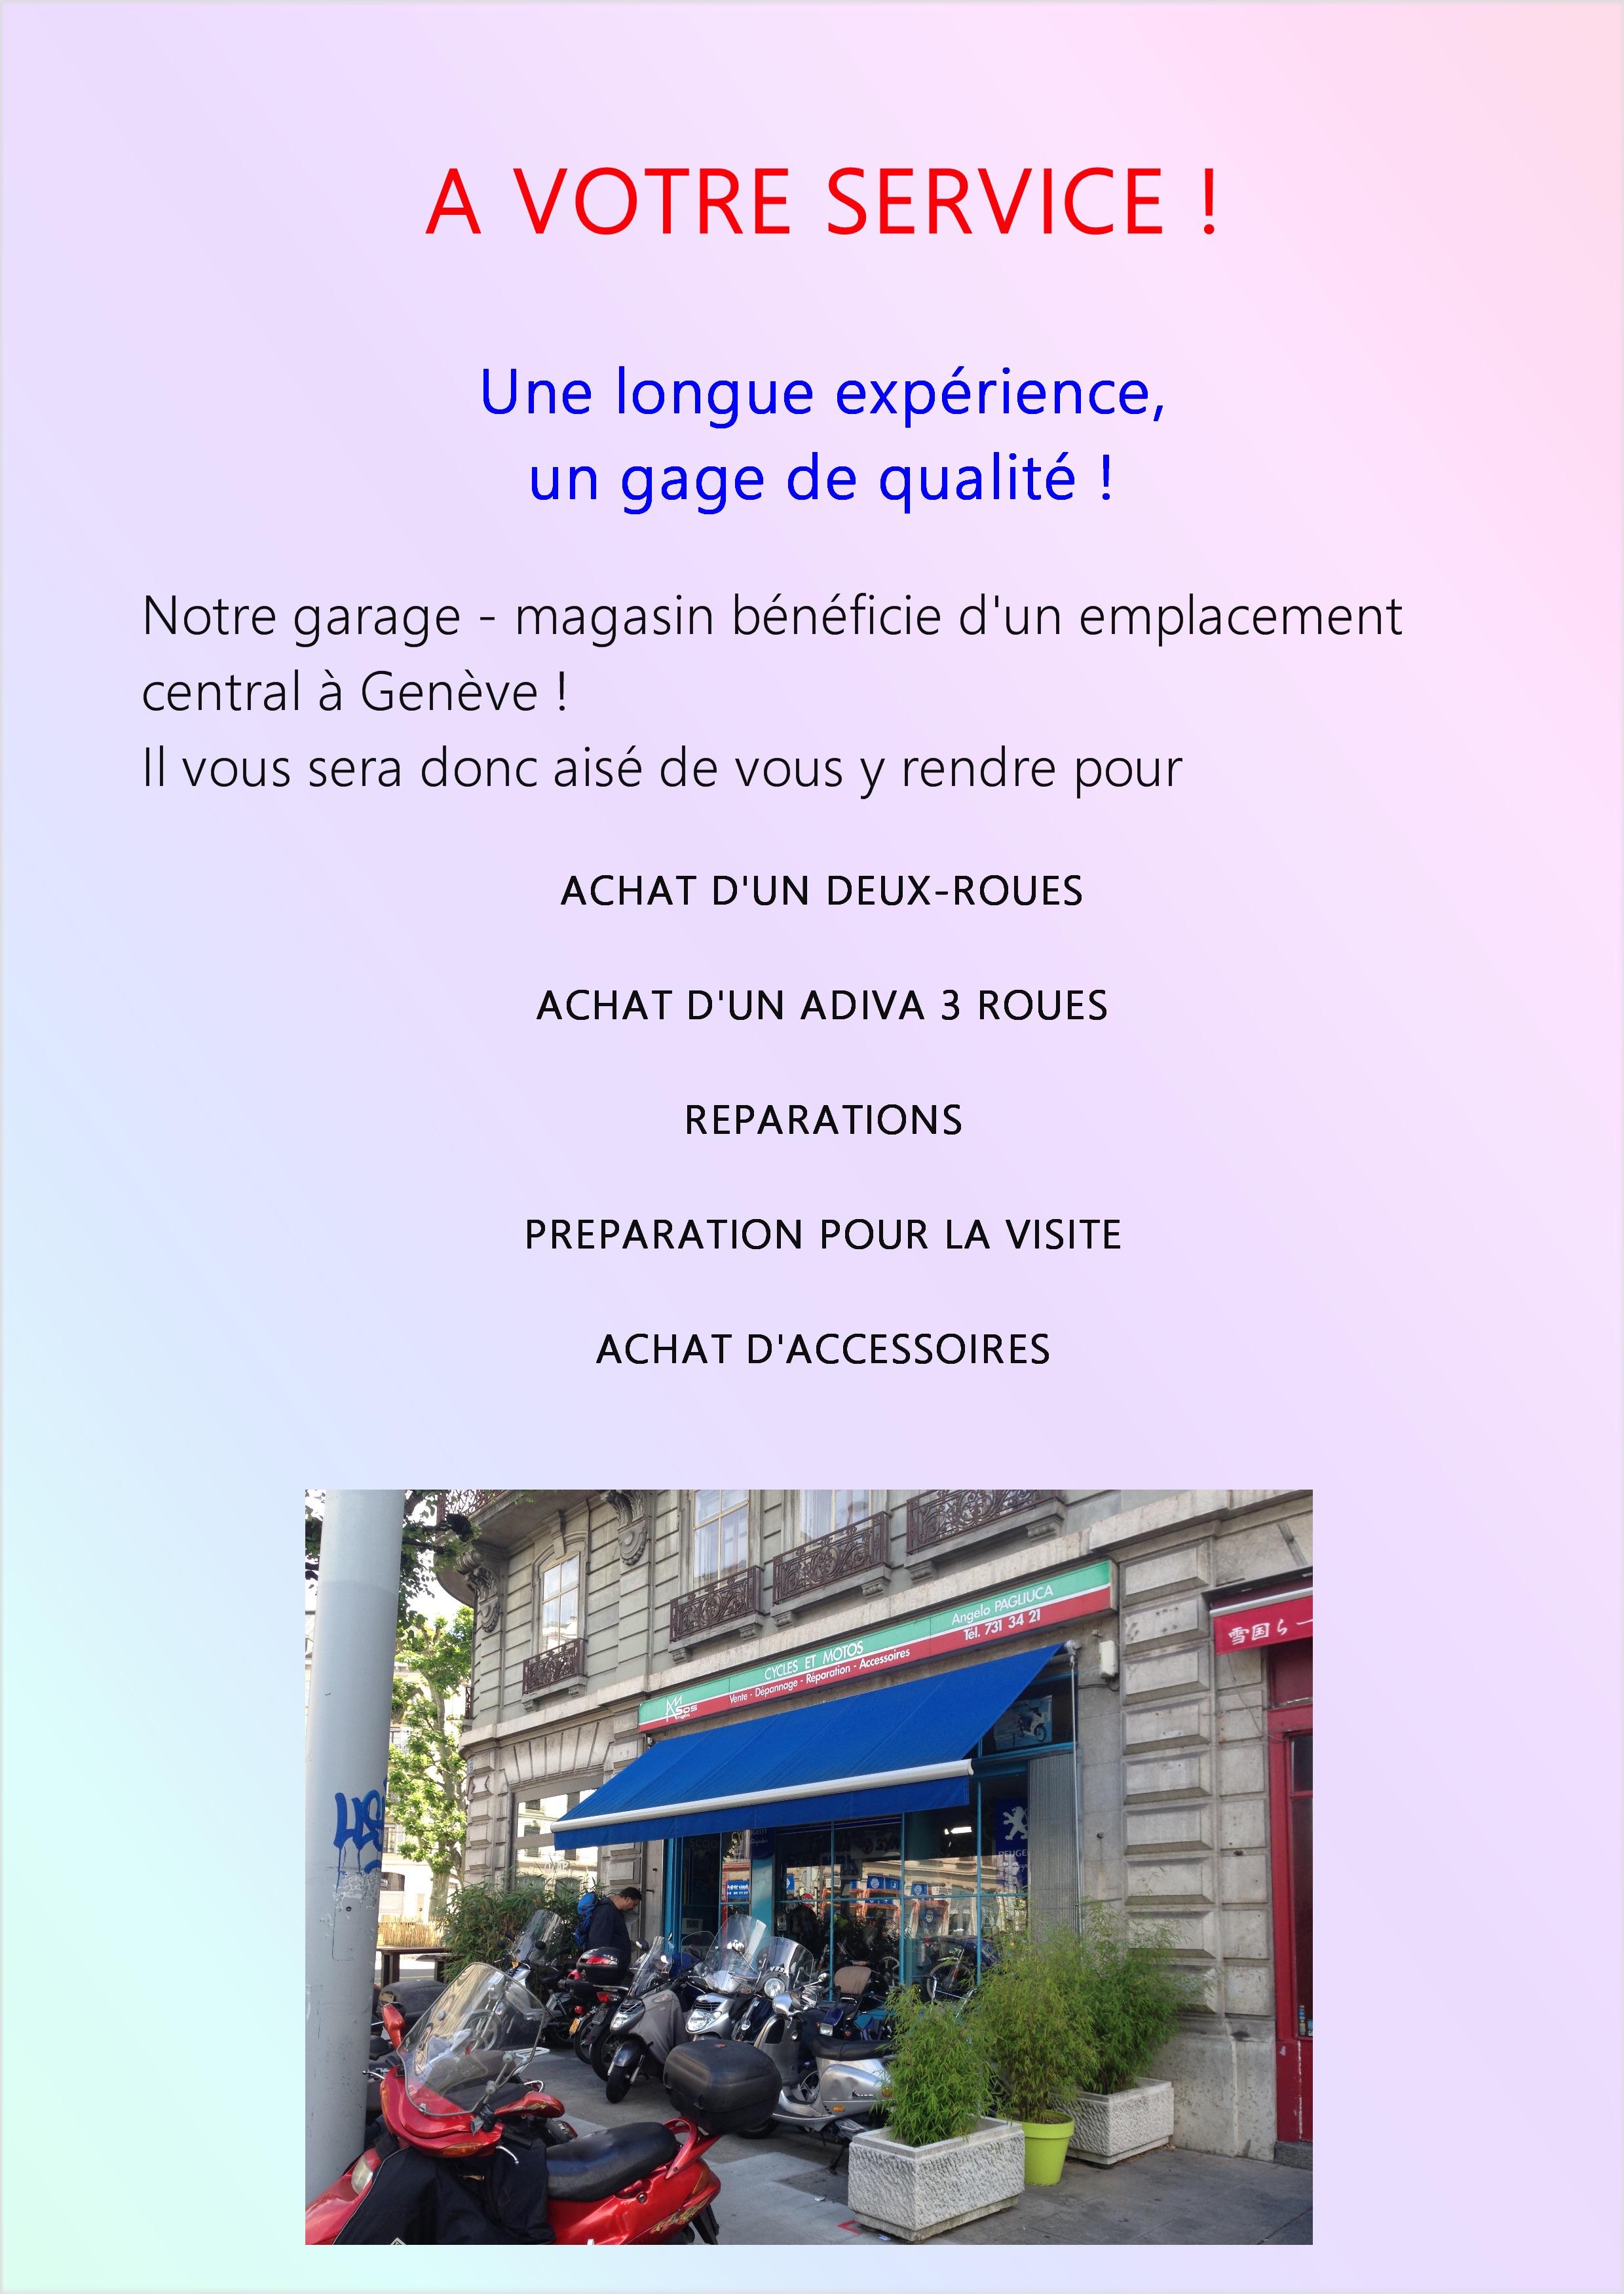 Adiva_services